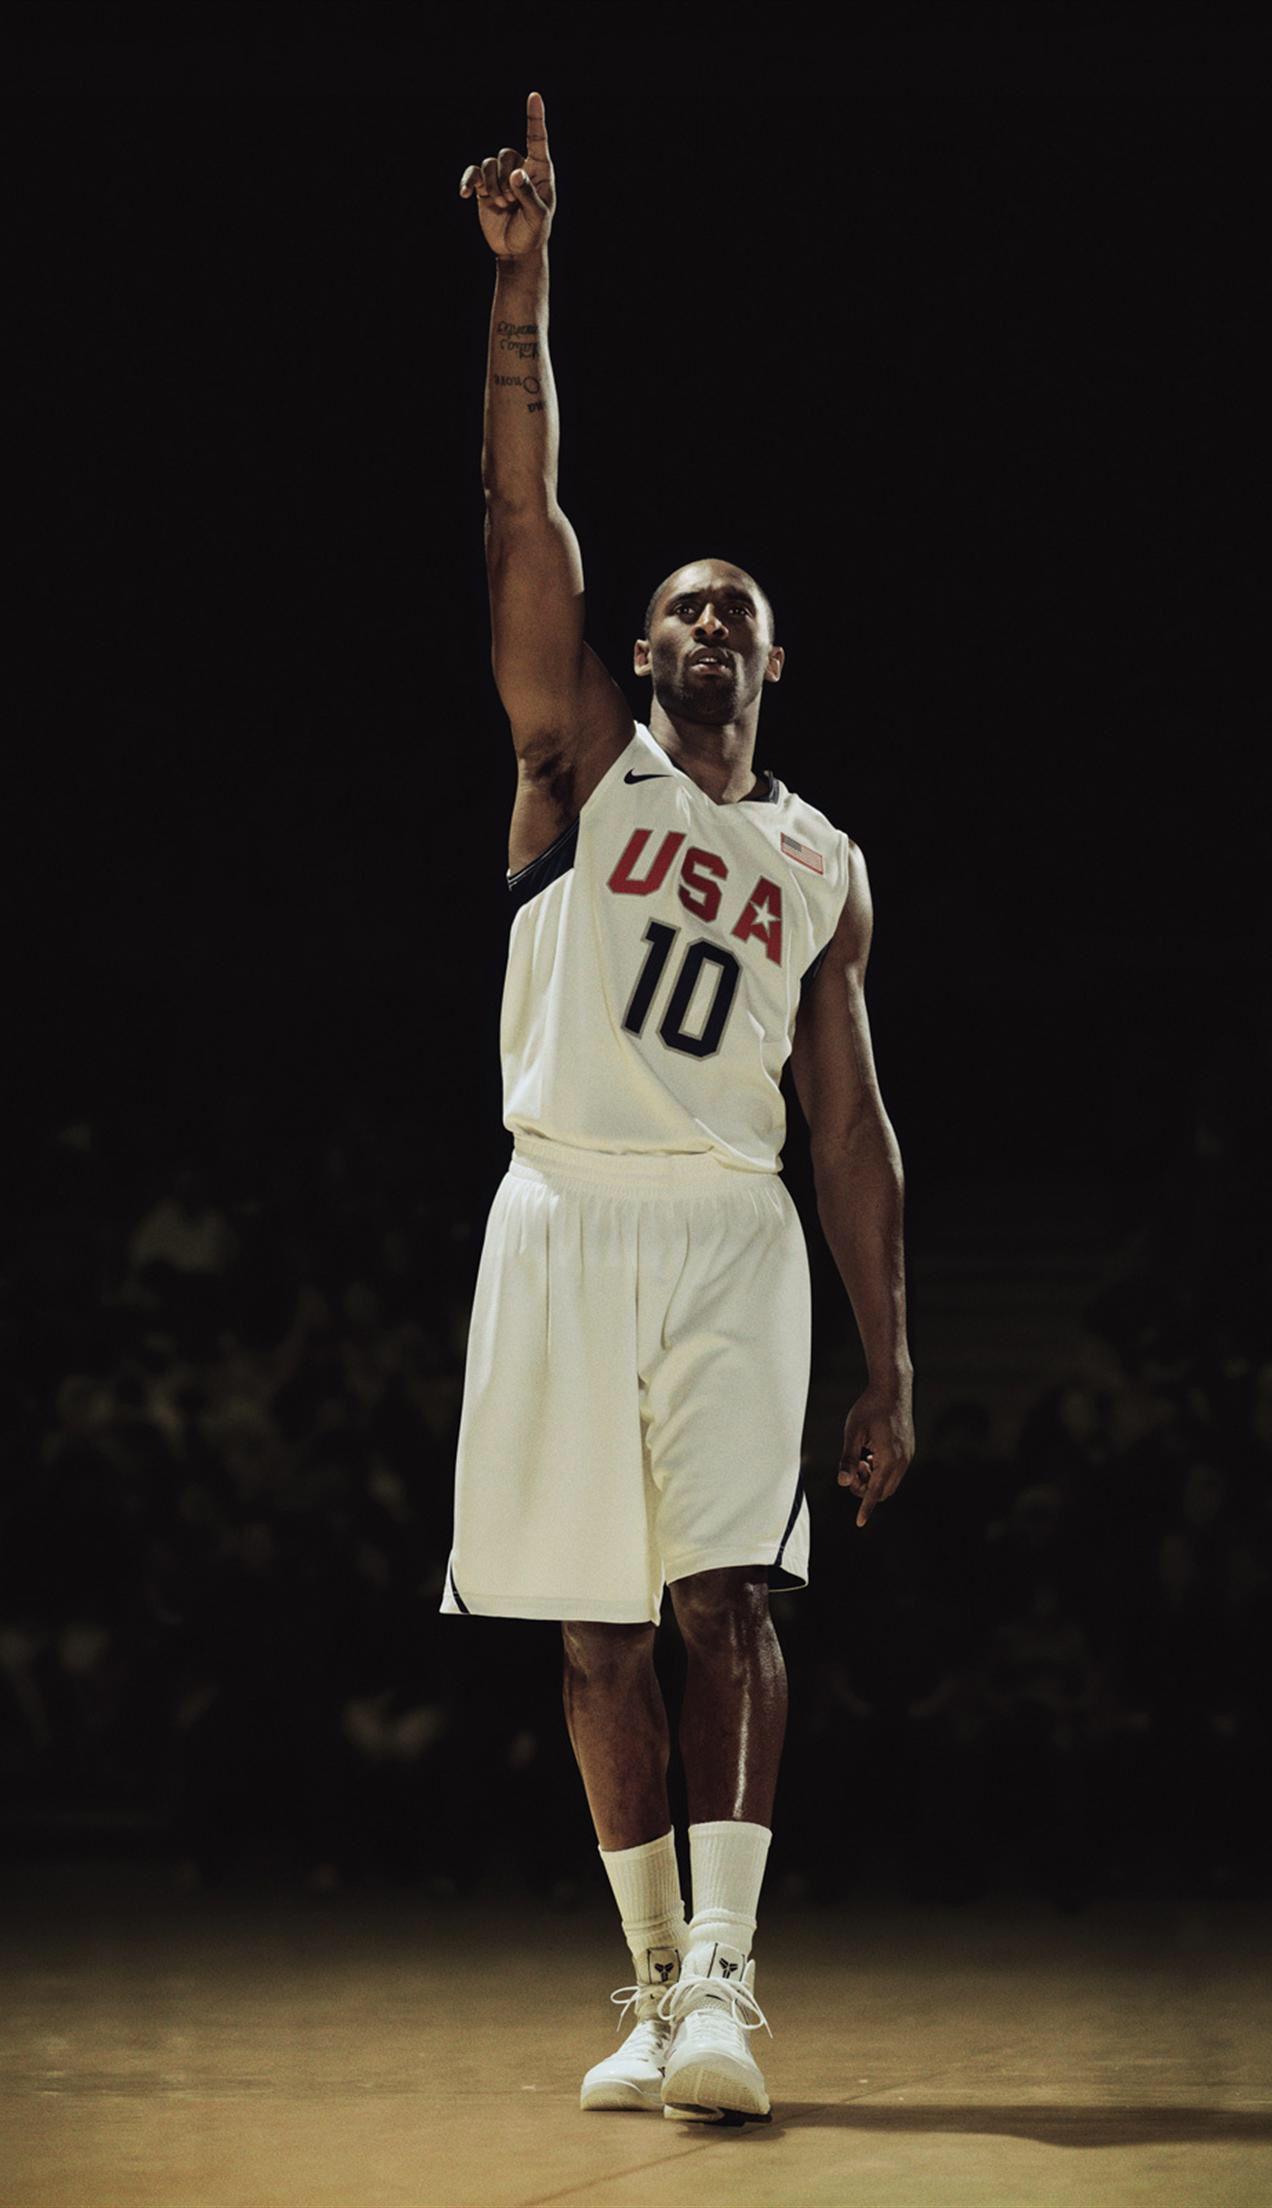 Http Stuckpix Com Wallpapershd I 7229 Kobe Bryant Iphone Wallpaper Bryant Basketball Kobe Bryant Wallpaper